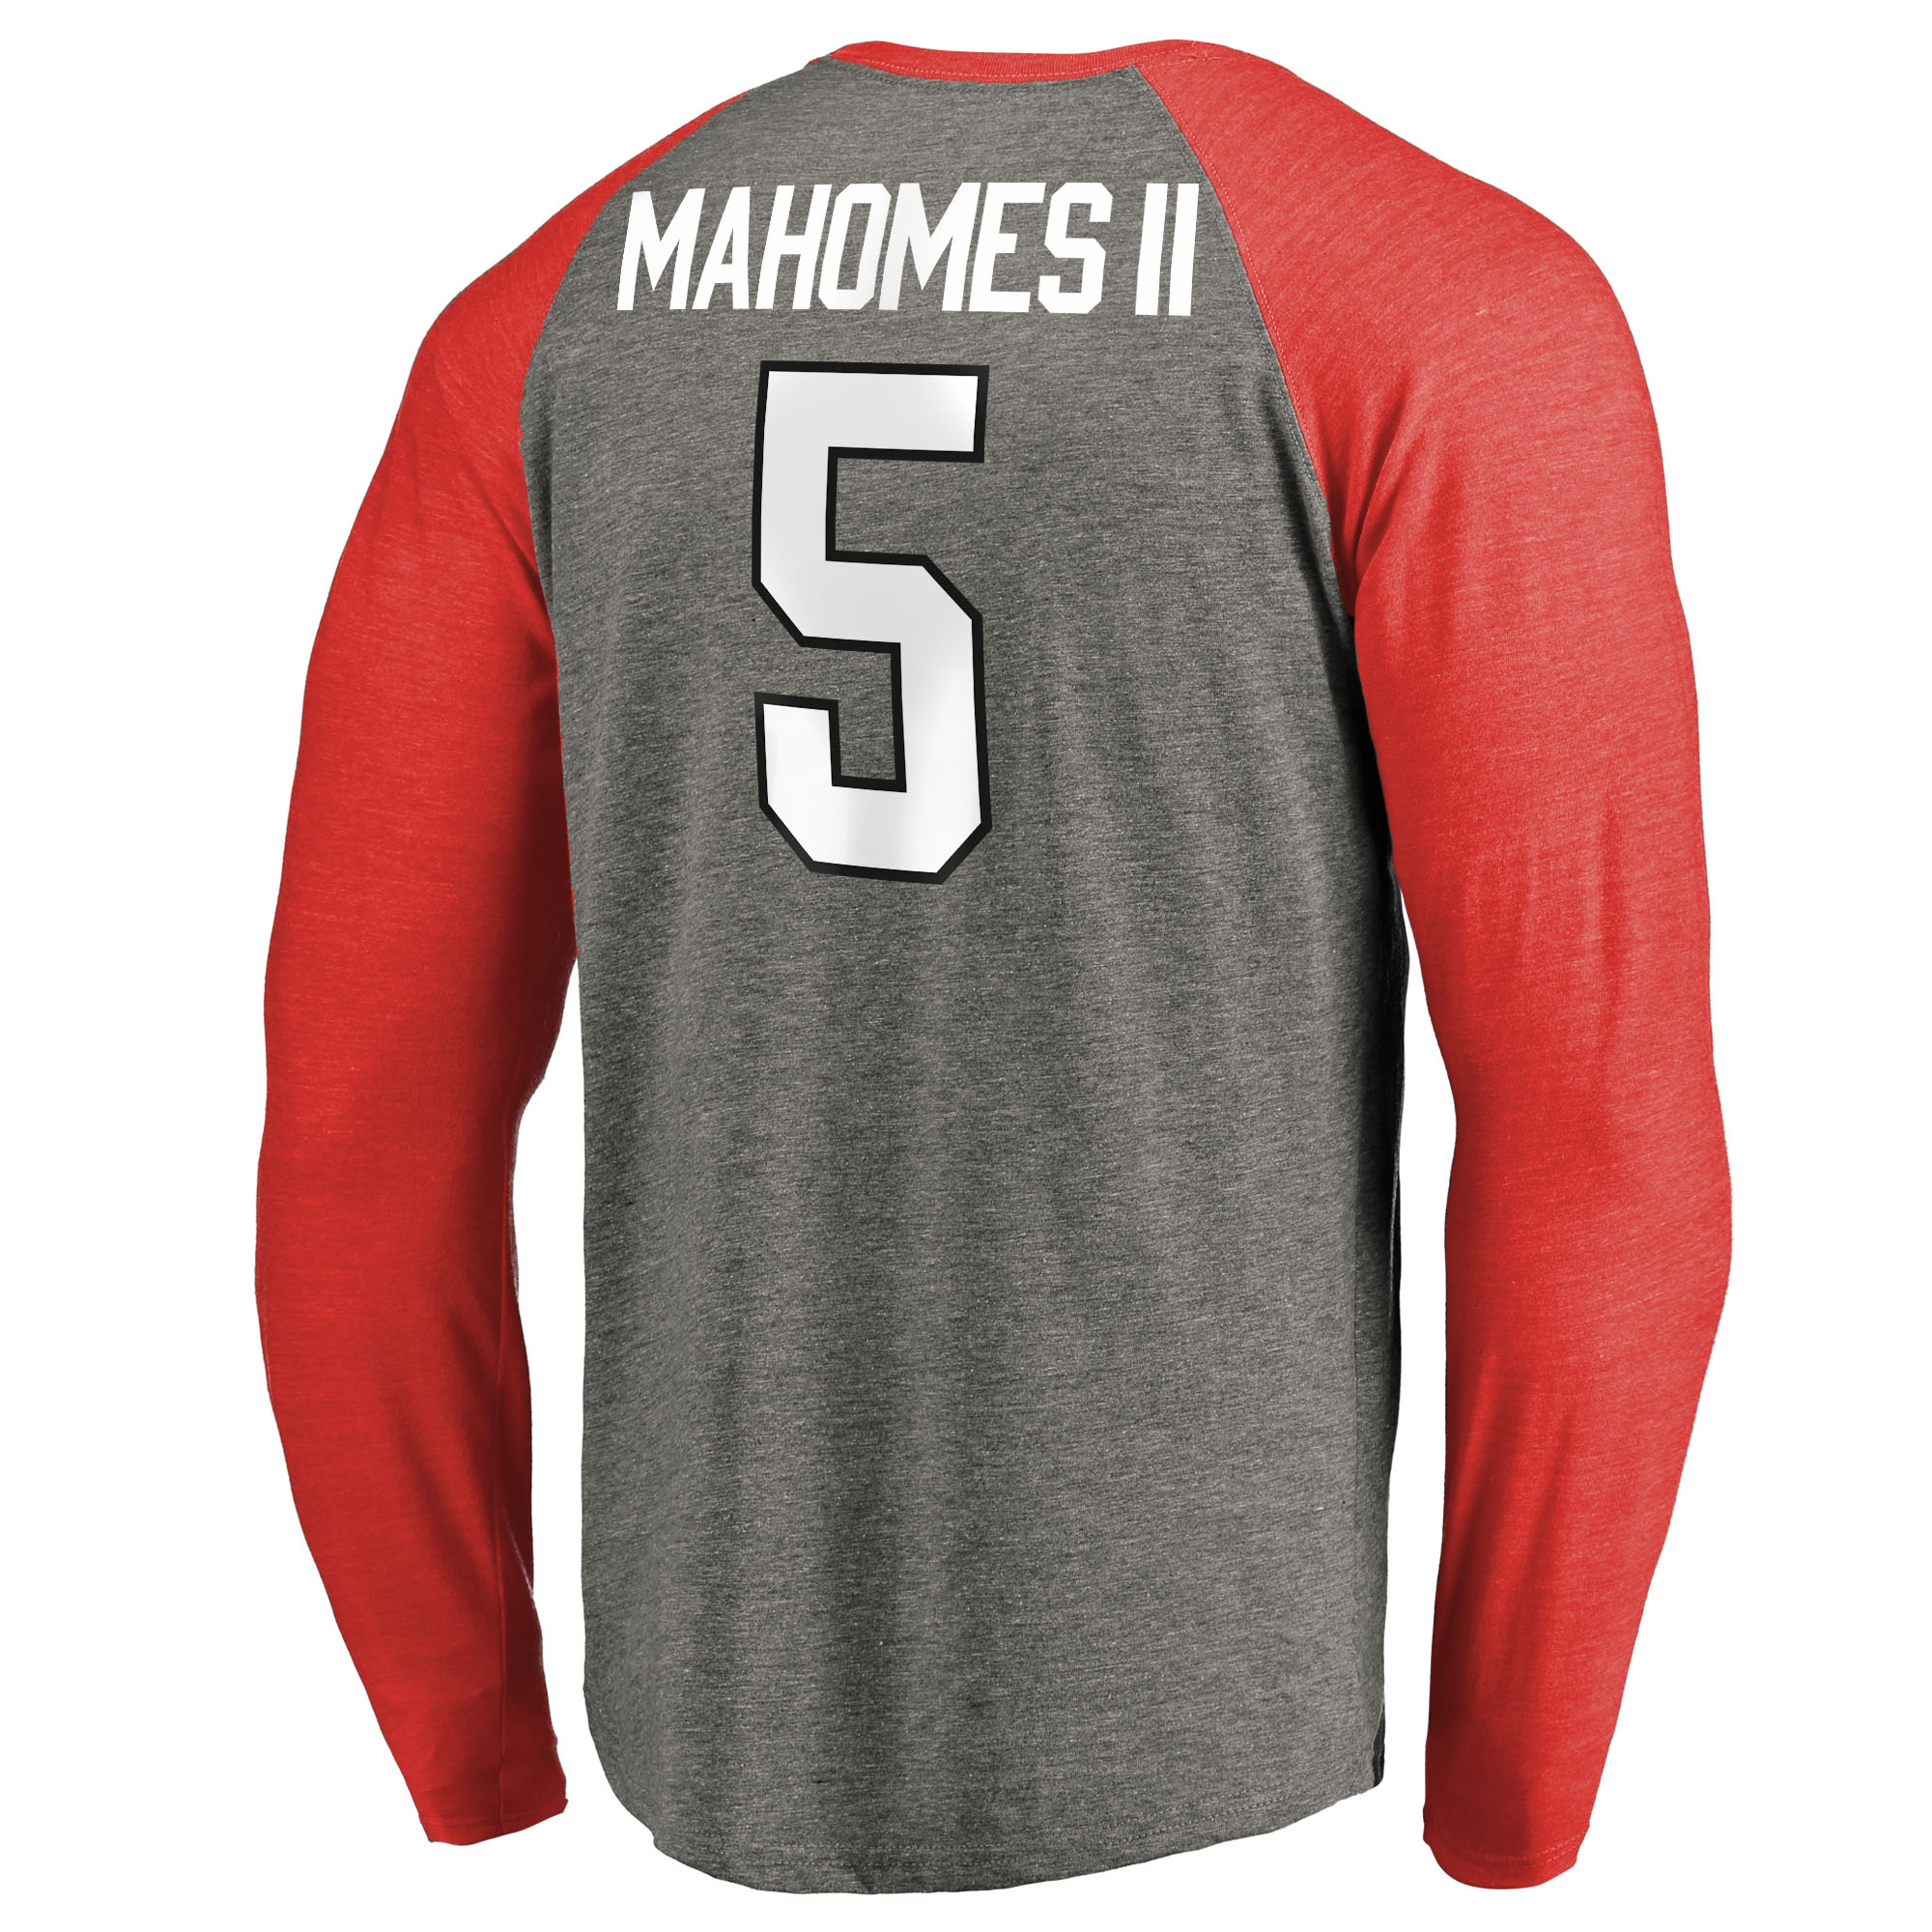 06e6693864d Patrick Mahomes Texas Tech Red Raiders Fanatics Branded Player Icon Name &  Number Raglan Tri-Blend Long Sleeve T-Shirt - Heathered Gray - Walmart.com